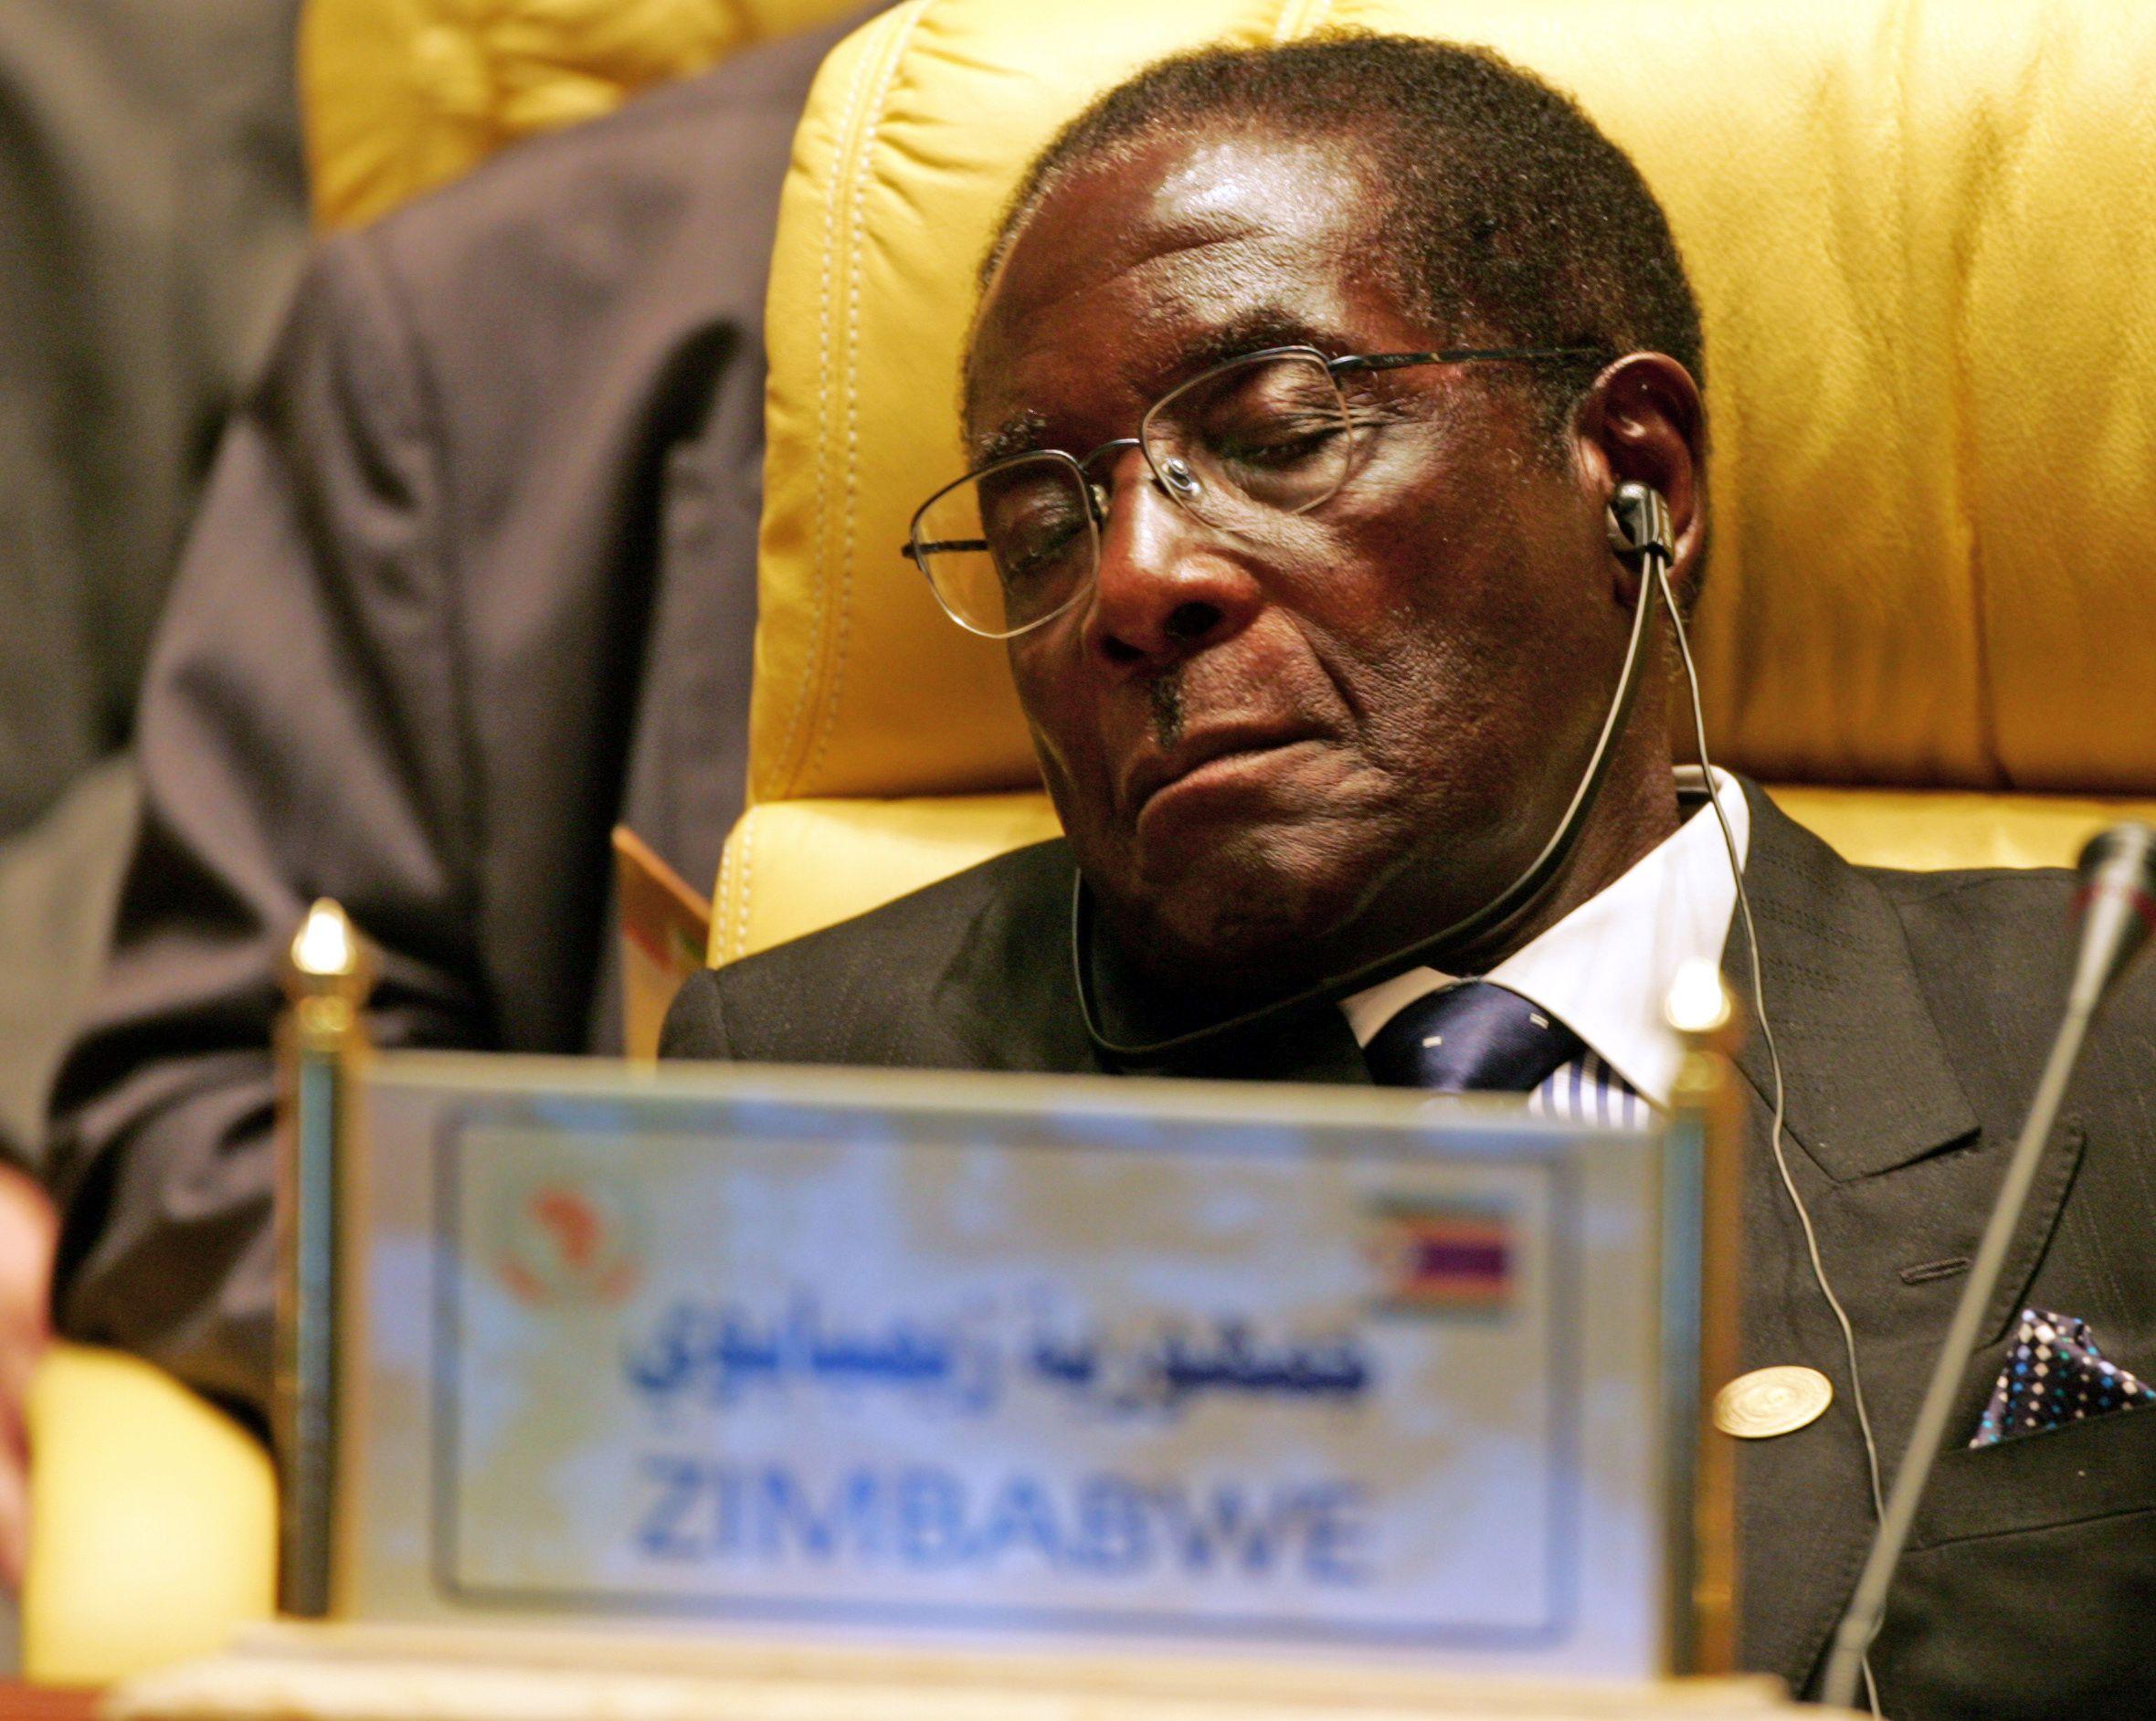 09_20_Mugabe_asleep